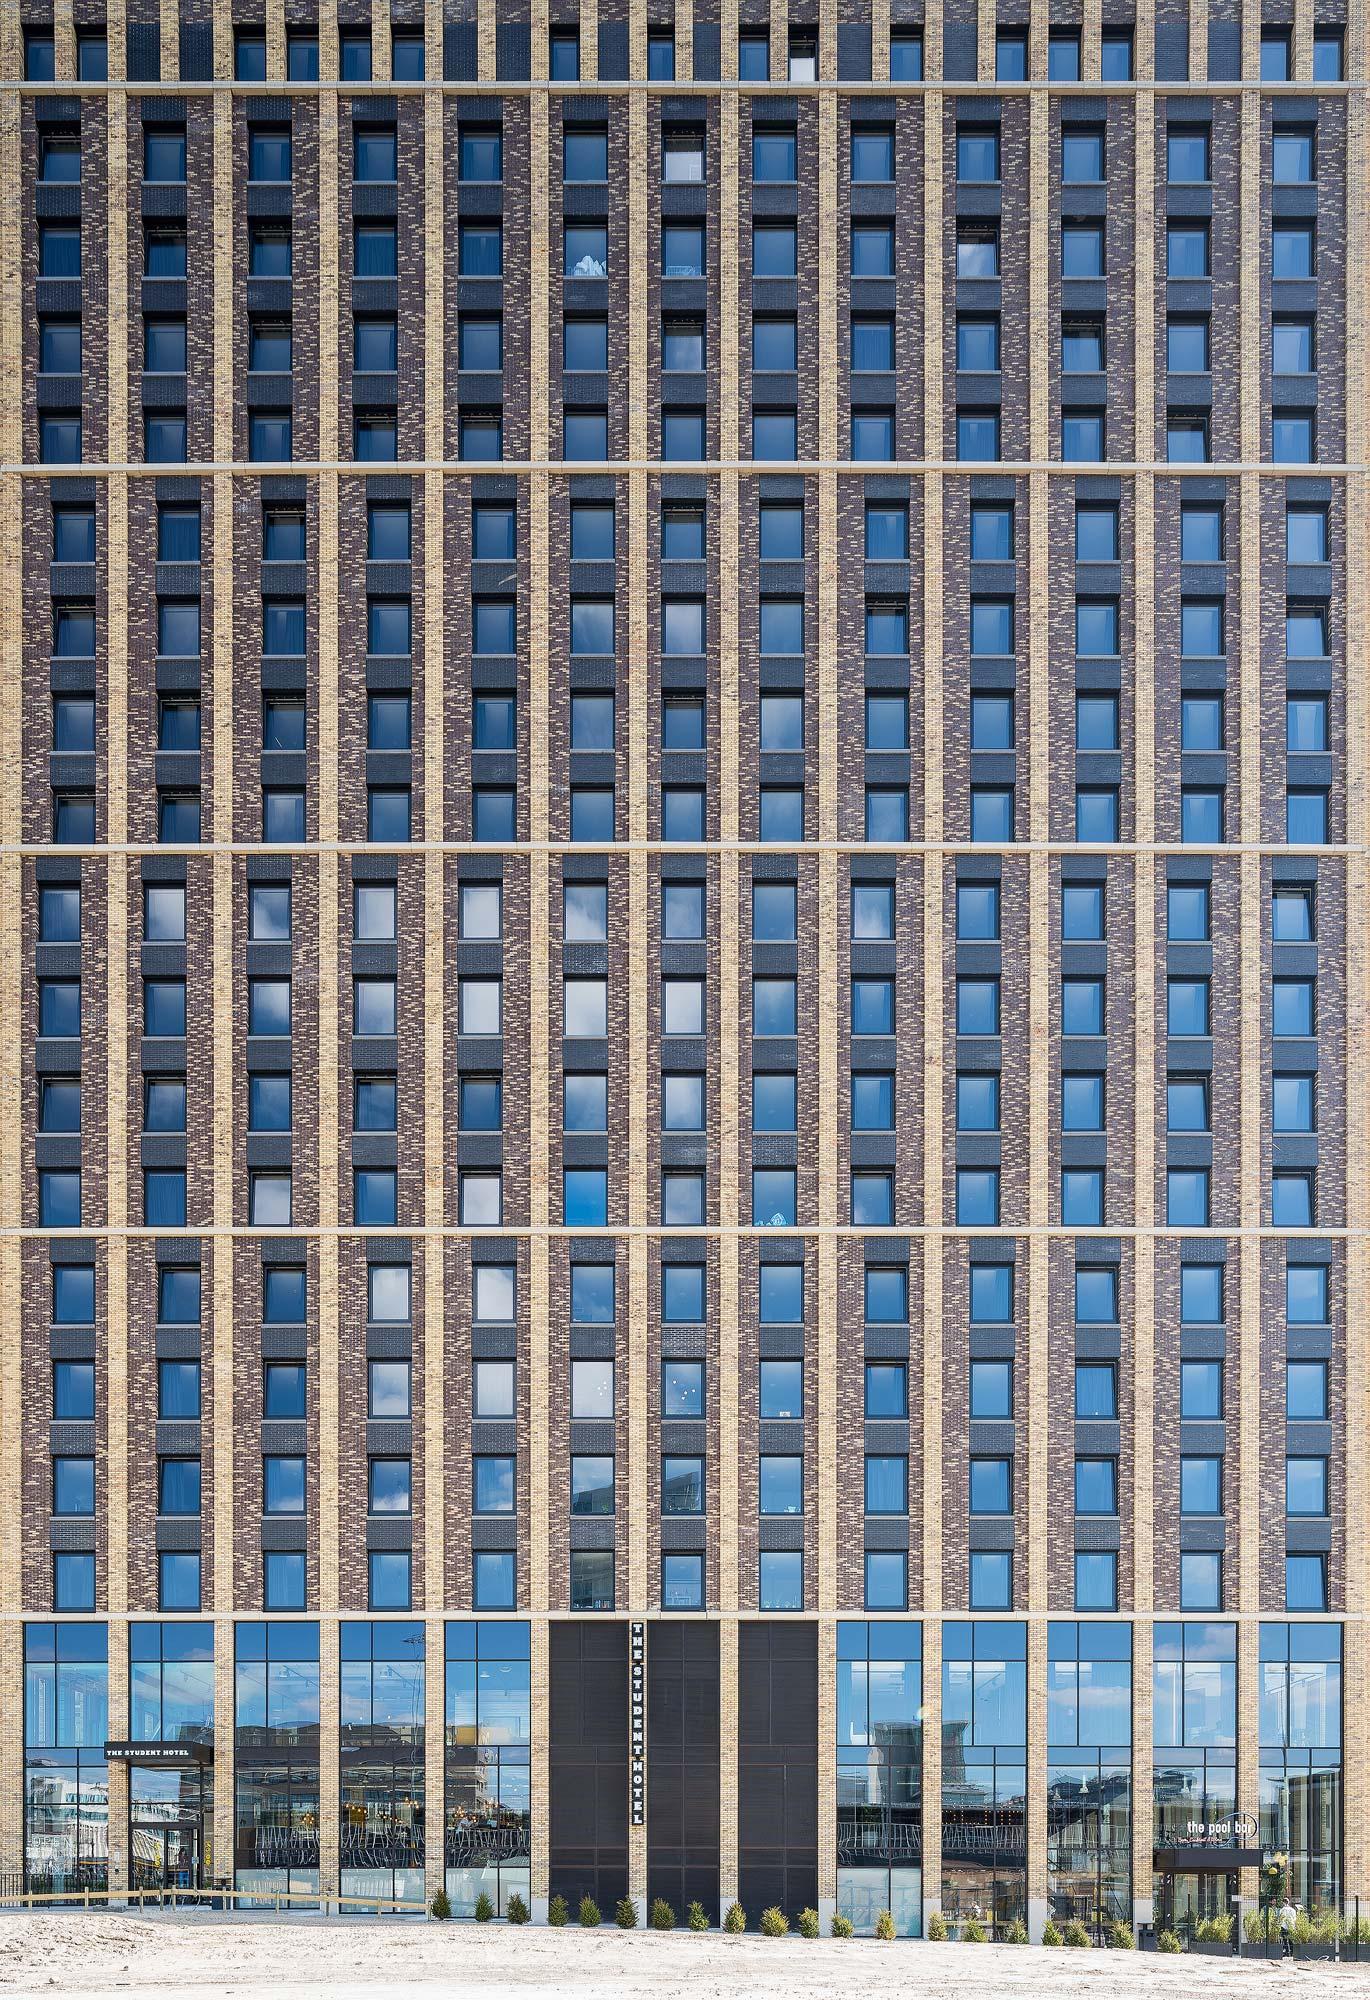 Student Hotel in EStudent Hotel Eindhoven - Architectuurfotograaf Chiel de Nooyerindhoven